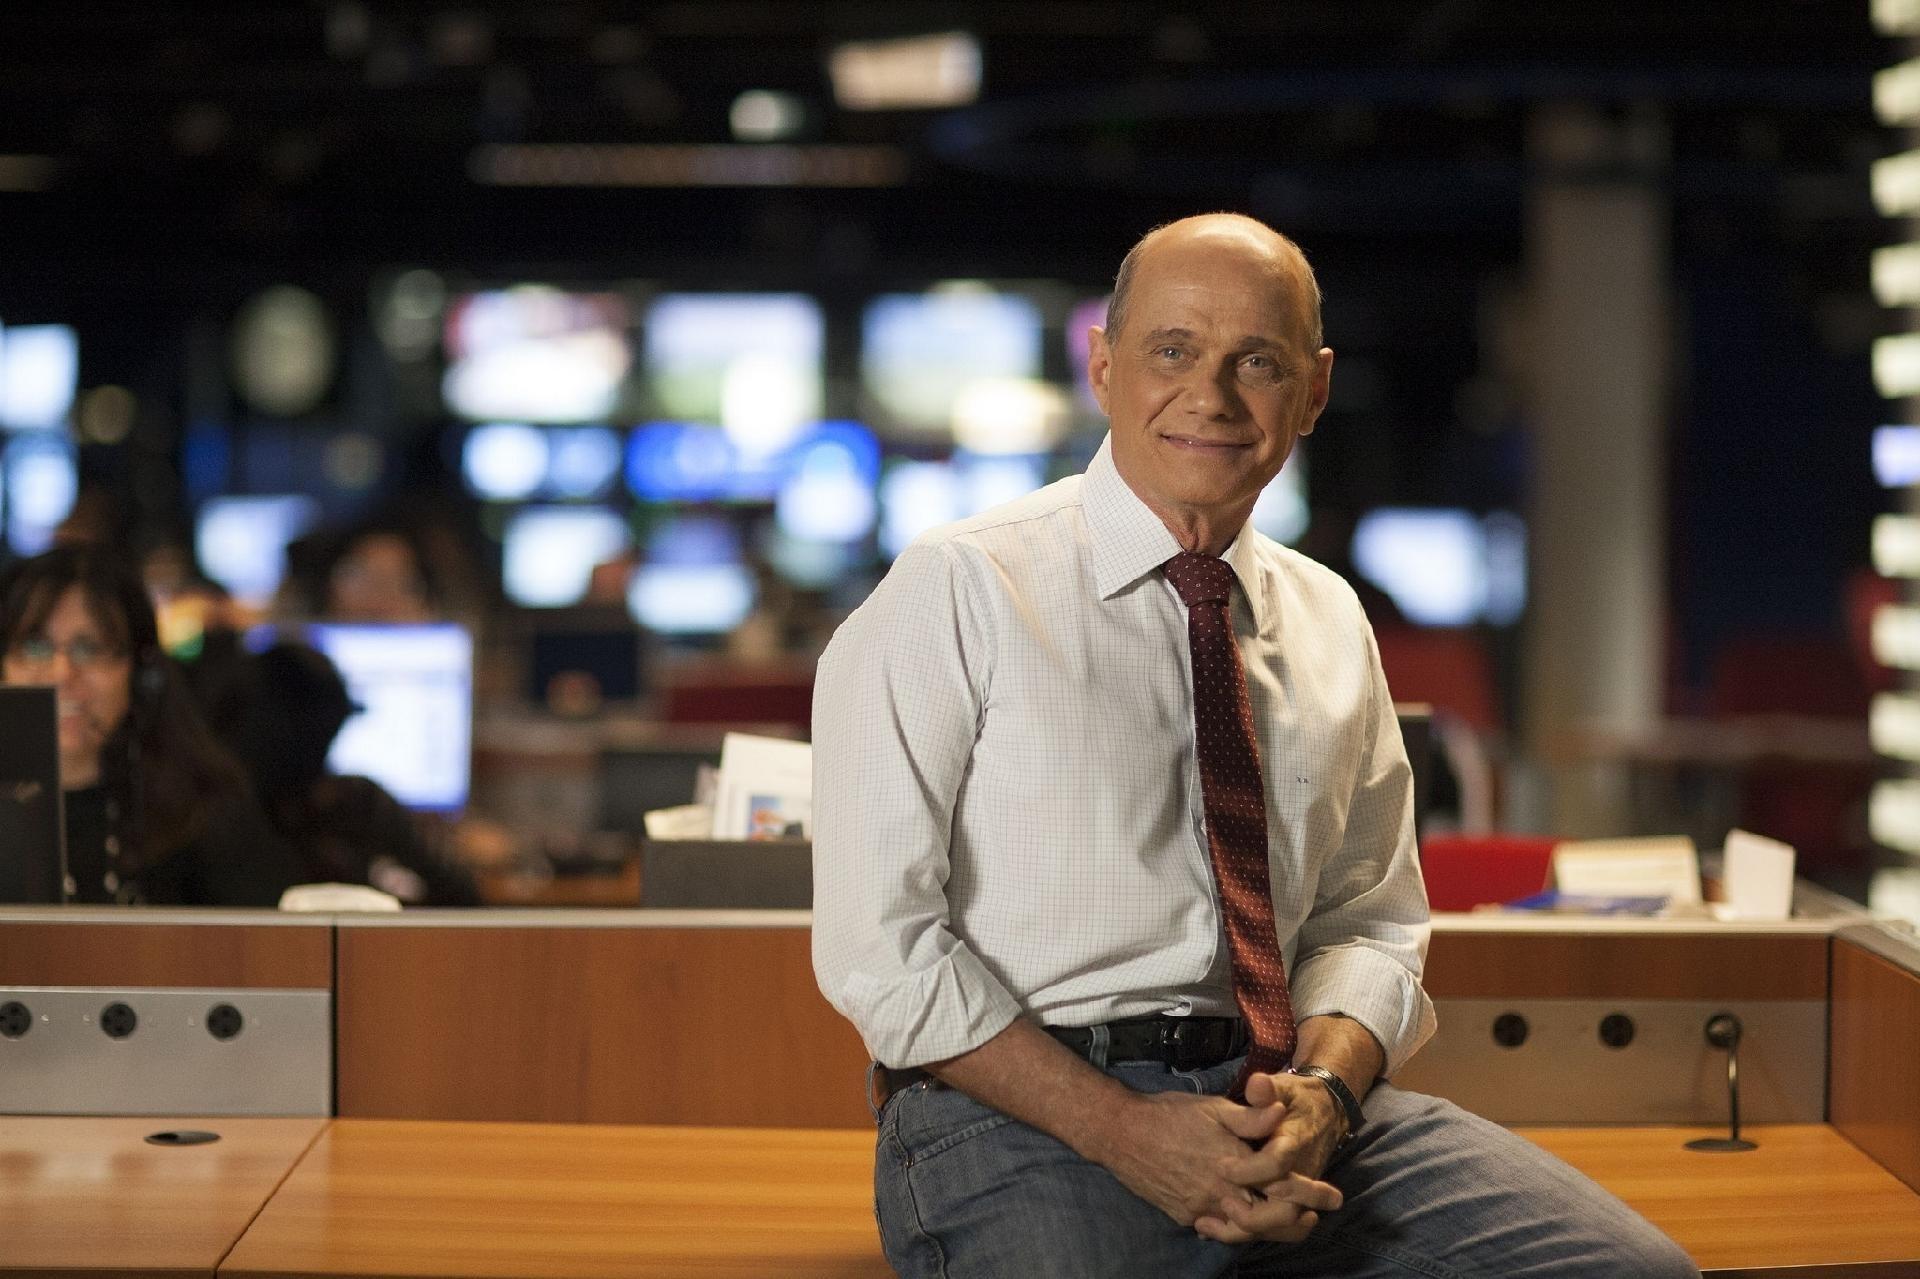 Jornalistas e admiradores lamentam a morte de Boechat